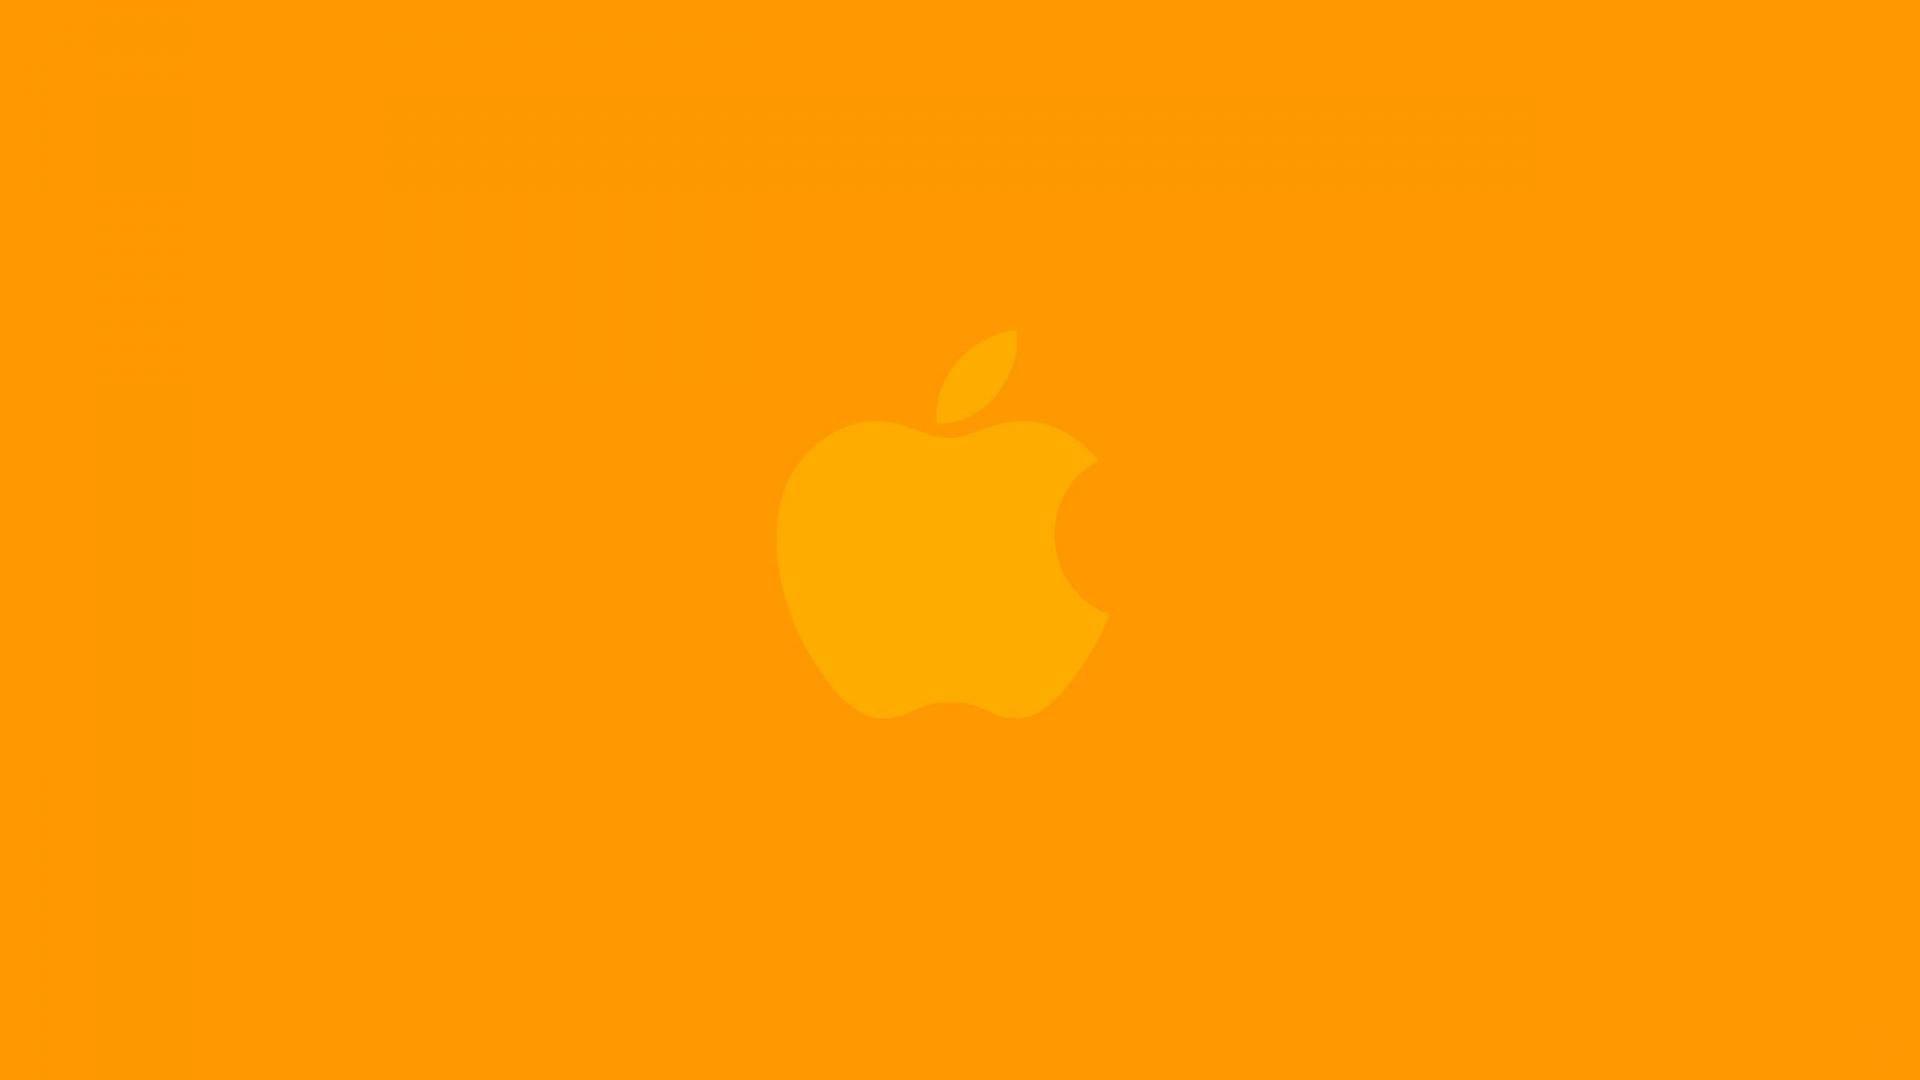 hd pics photos orange cute apple logo best 2 desktop background wallpaper